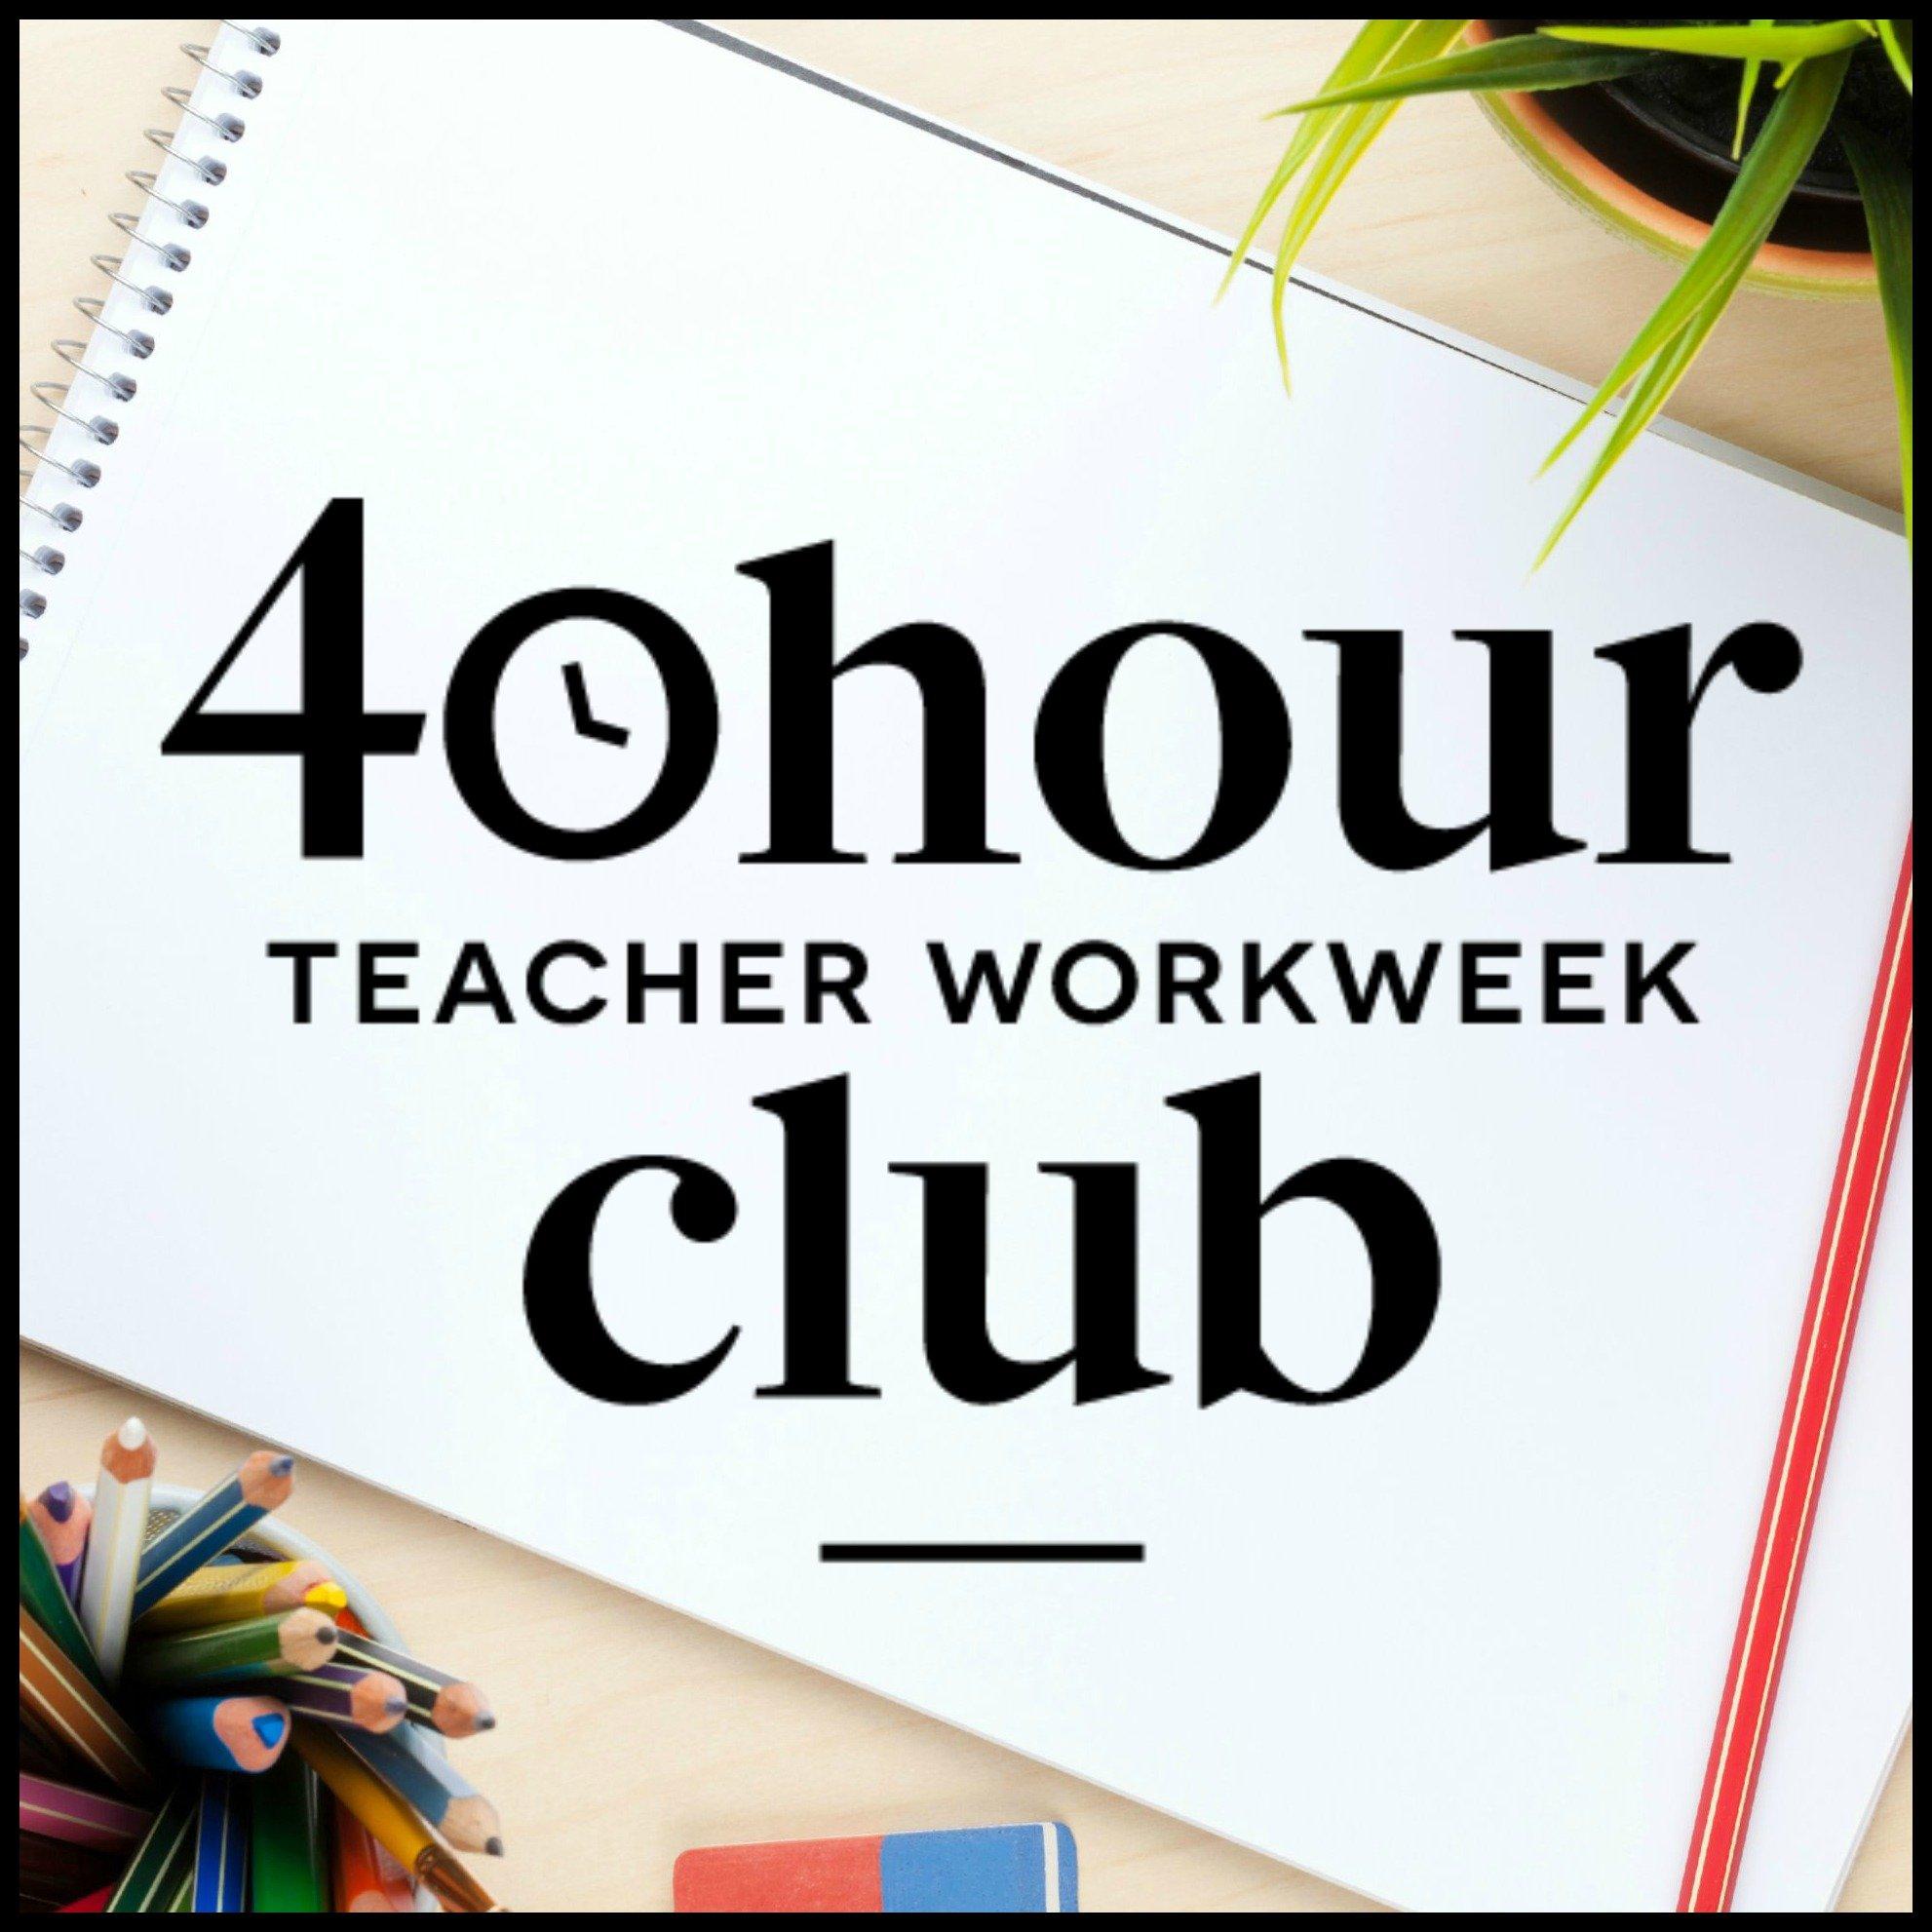 find balance with angela watson's 40 hour teacher workweek club